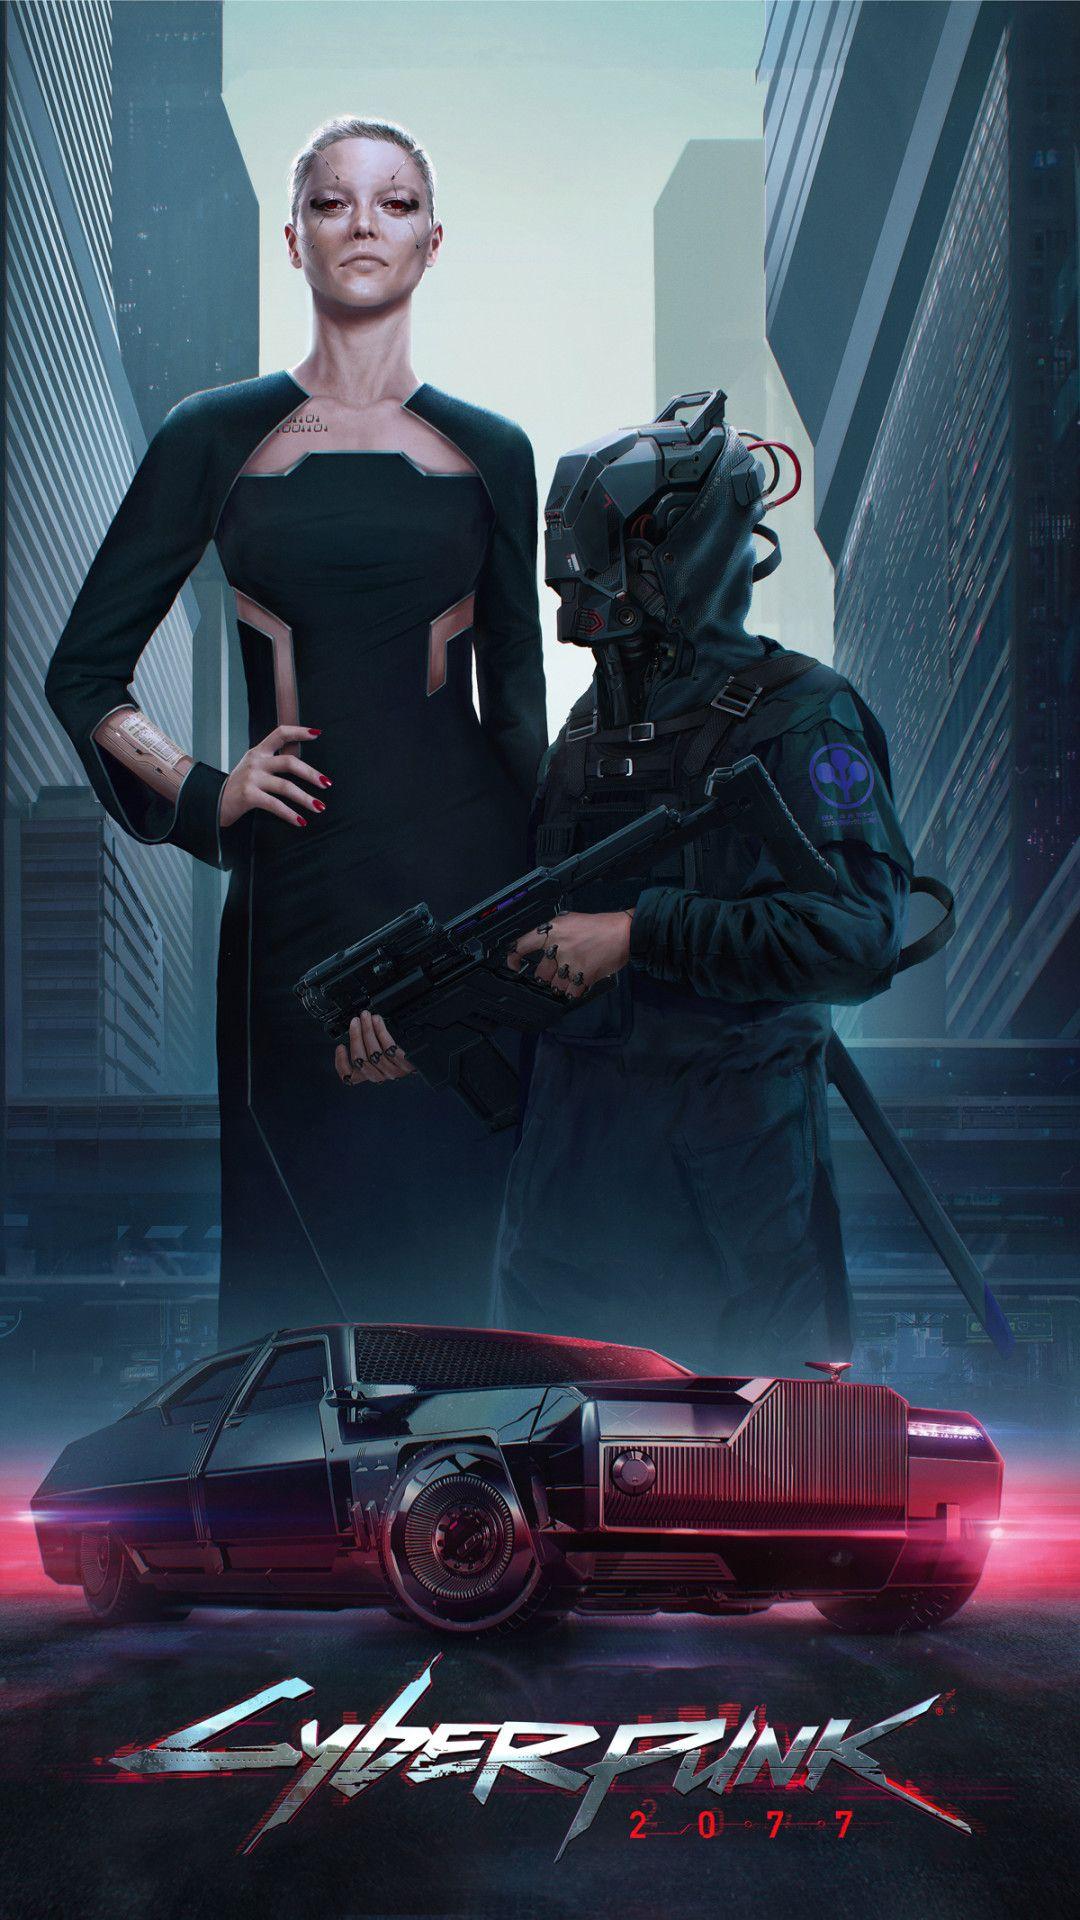 Cyberpunk 2077 2019 Poster 4k Mobile Wallpaper Iphone Android Samsung Pixel Xiaomi In 2020 Cyberpunk 2077 Cyberpunk Character Cyberpunk